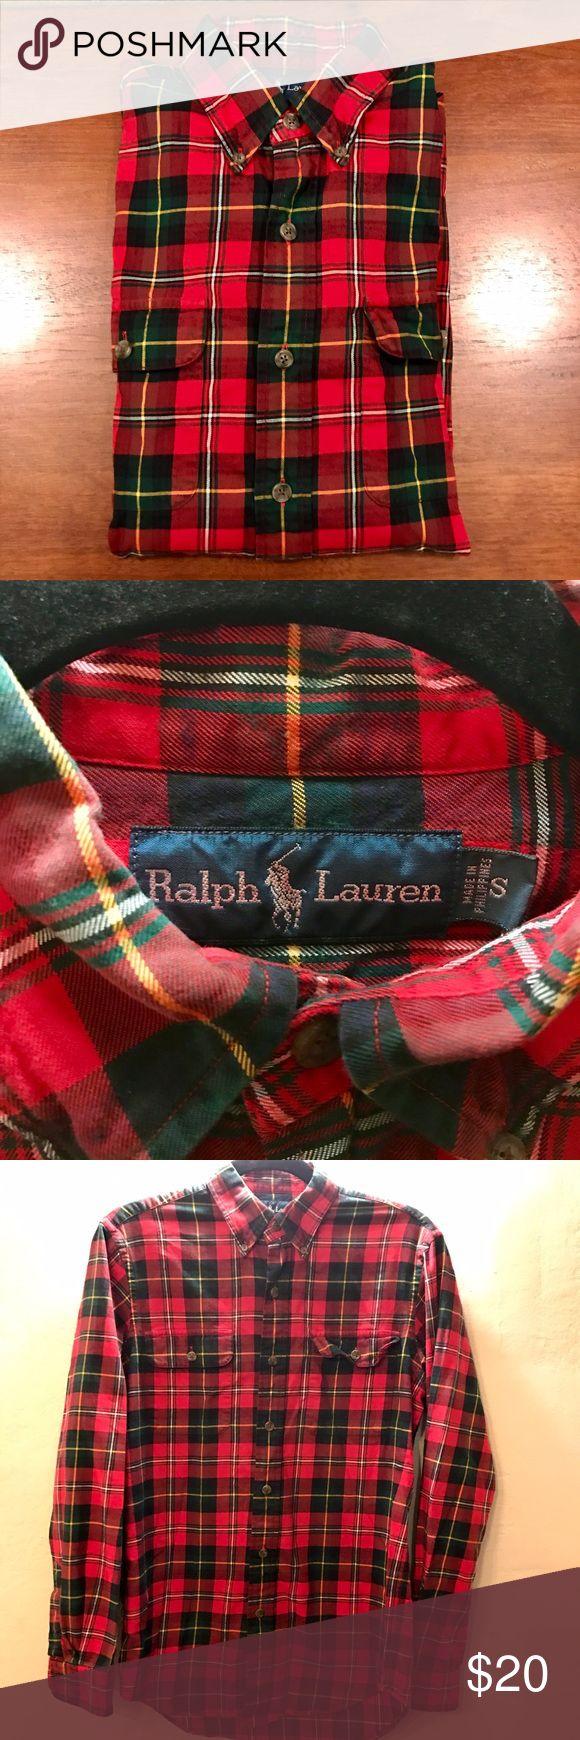 Ralph Lauren Plaid Shirt | Men's Small Gently worn, no rips or stains. Authentic Ralph Lauren Men's plaid shirt in Small. Can be worn as Women's Medium. Ralph Lauren Shirts Casual Button Down Shirts